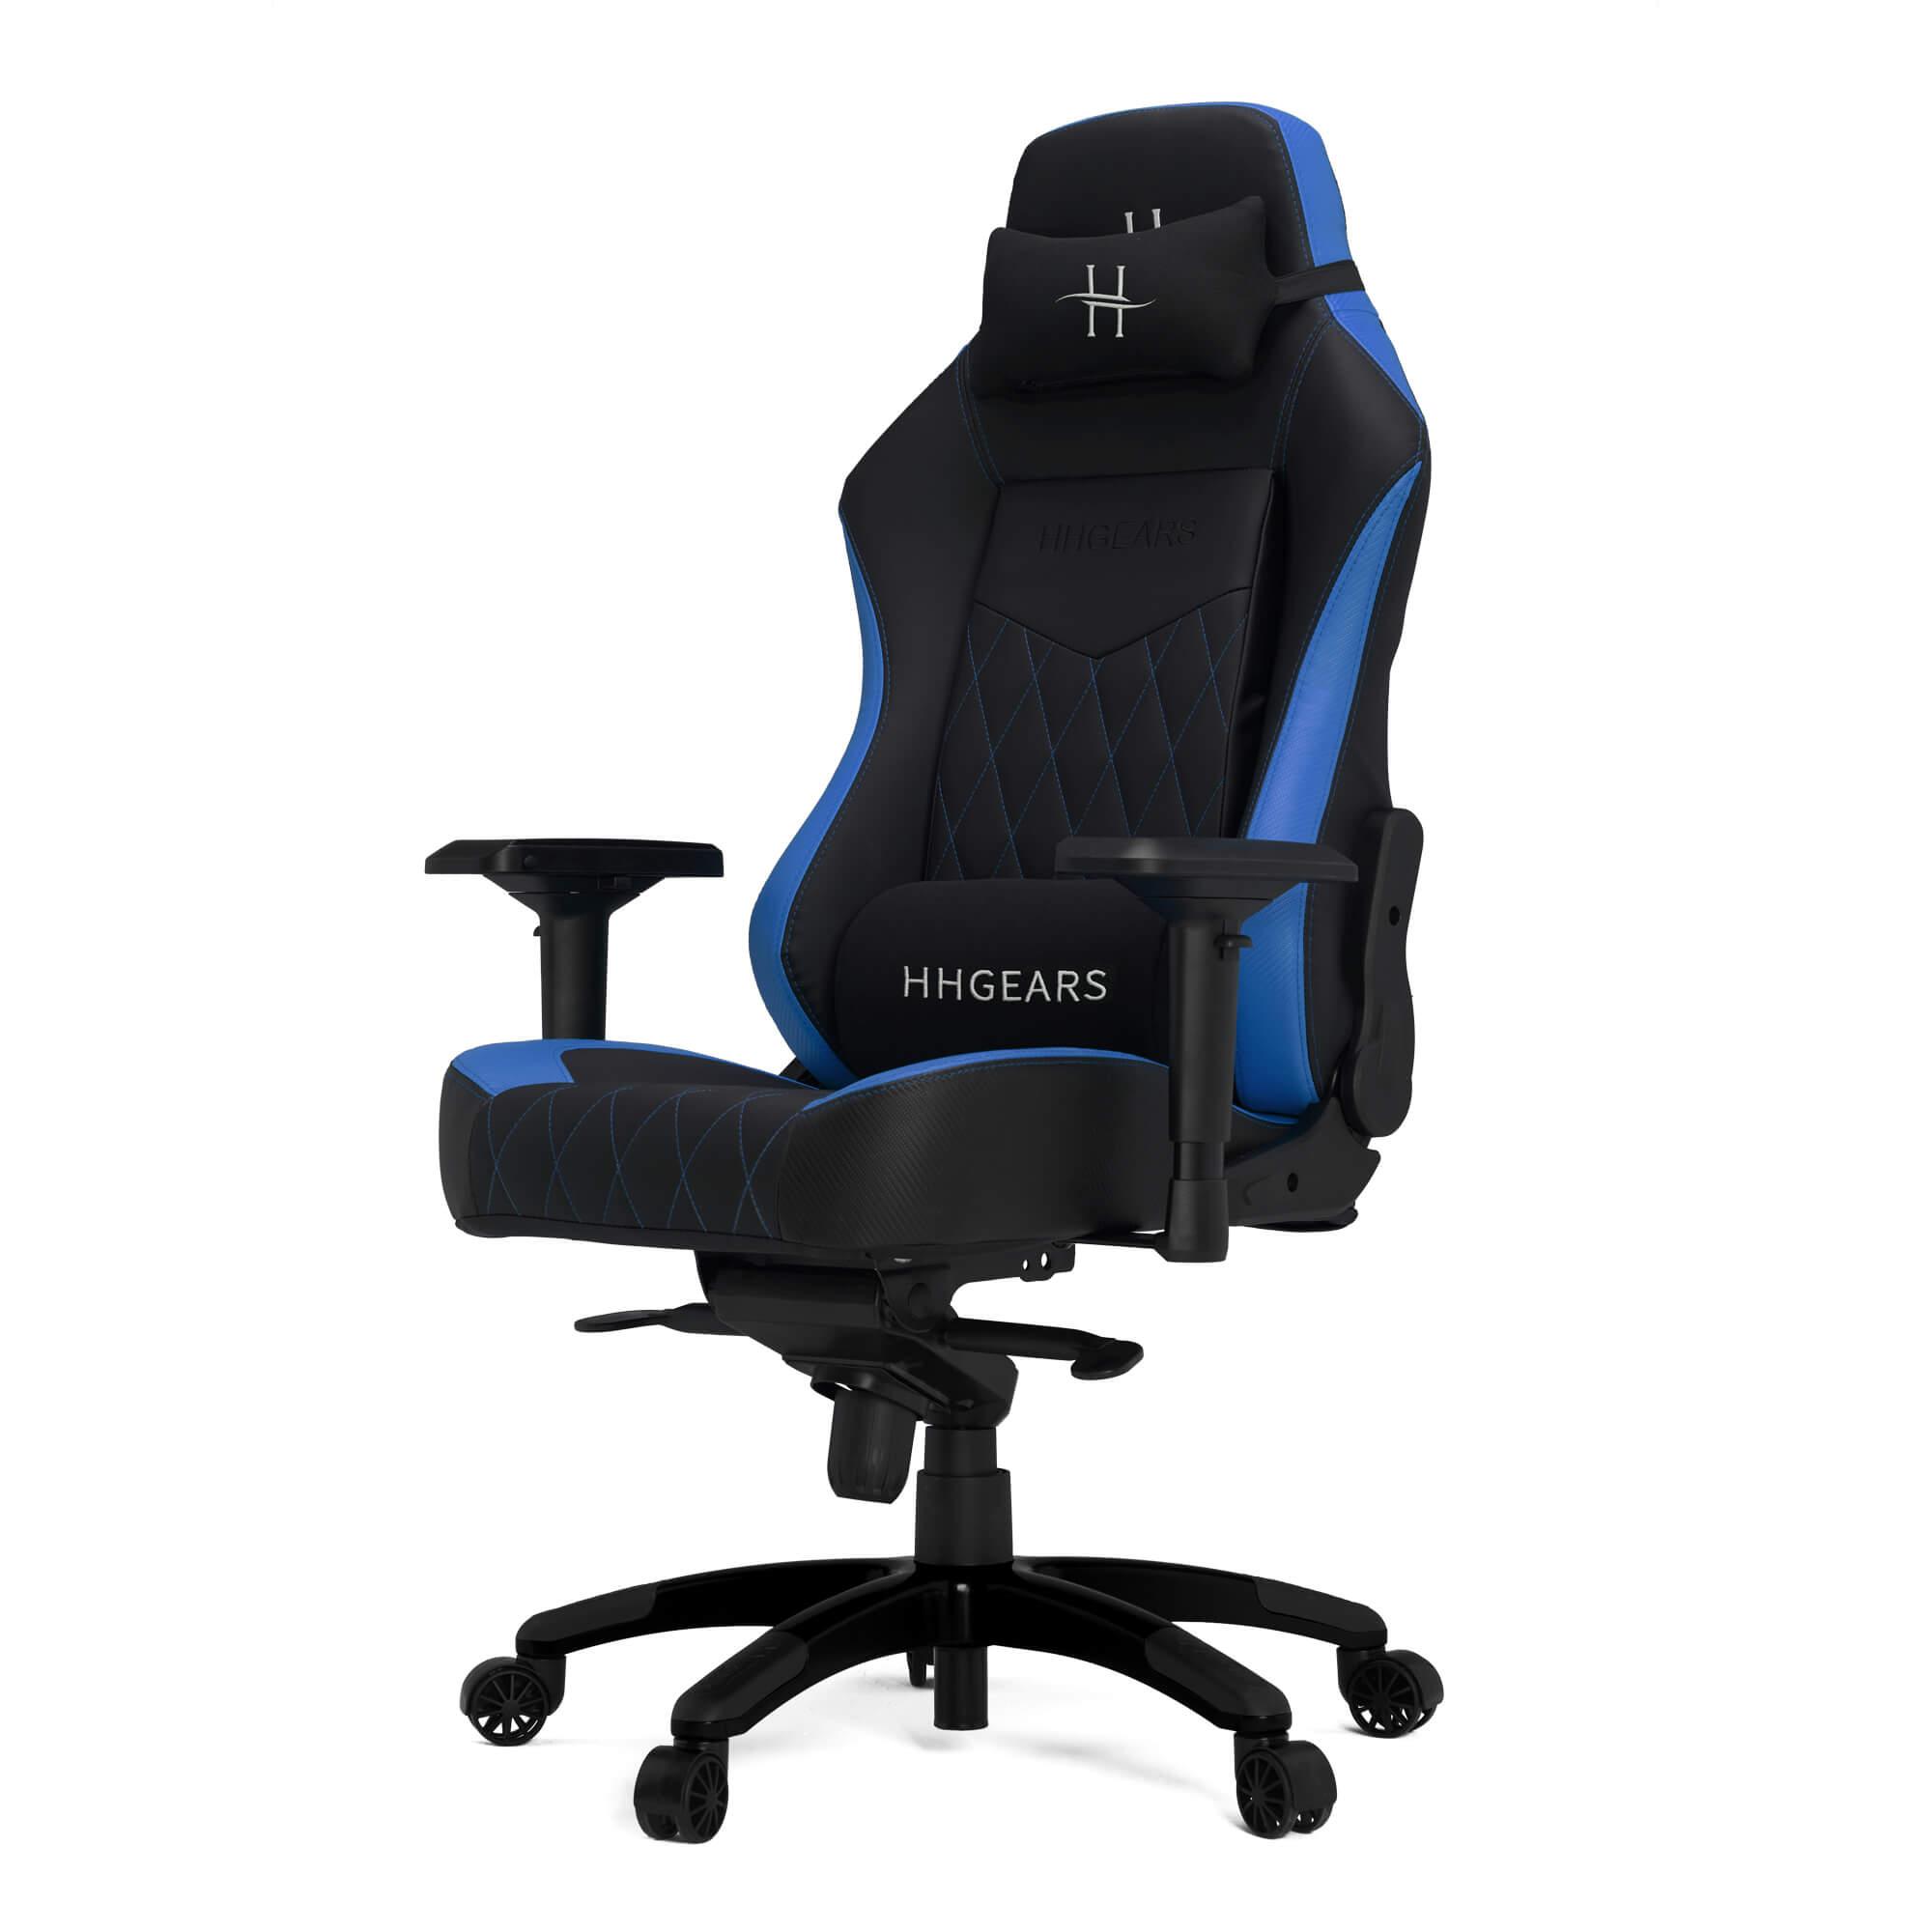 SILLA GAMER HHGEARS XL800 BLACK/BLUE